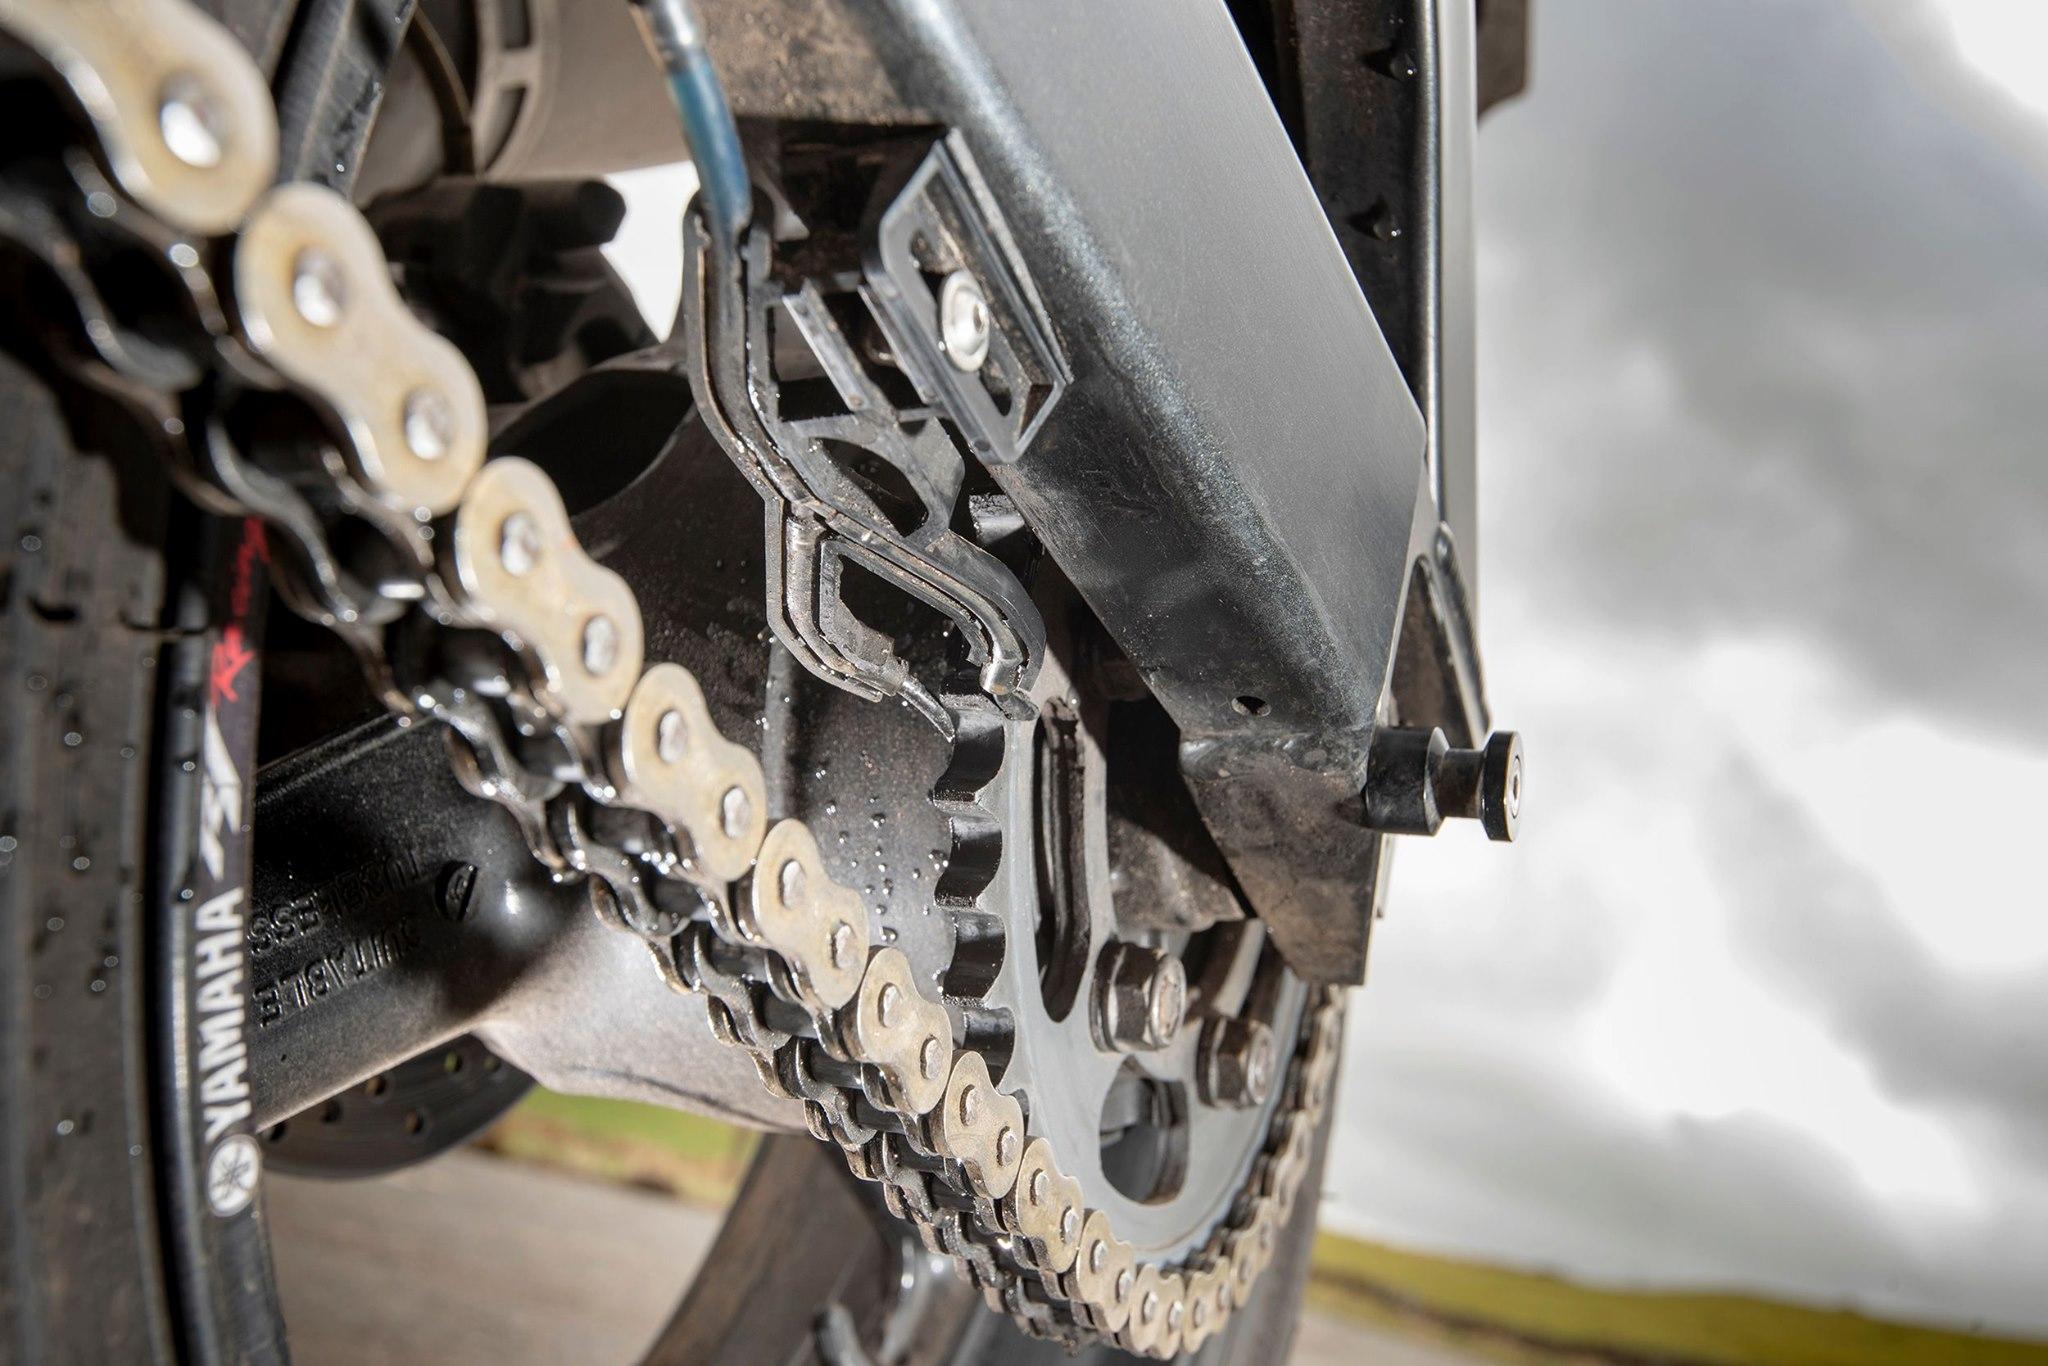 Scottoiler V-system clean chain